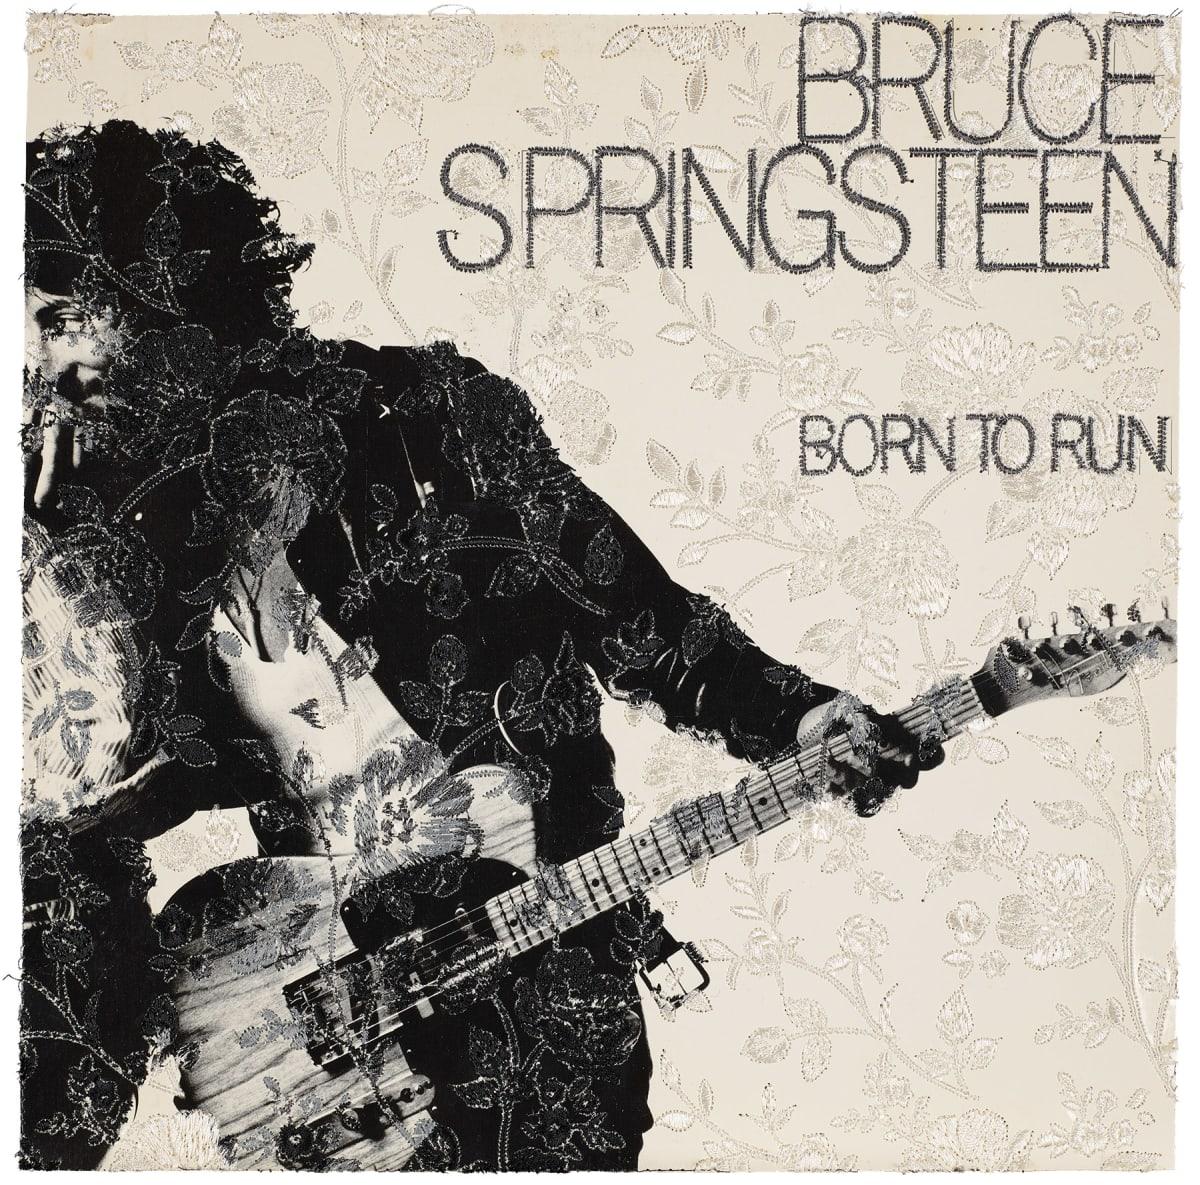 Stephen Wilson, Born to Run, Bruce Springsteen , 2019